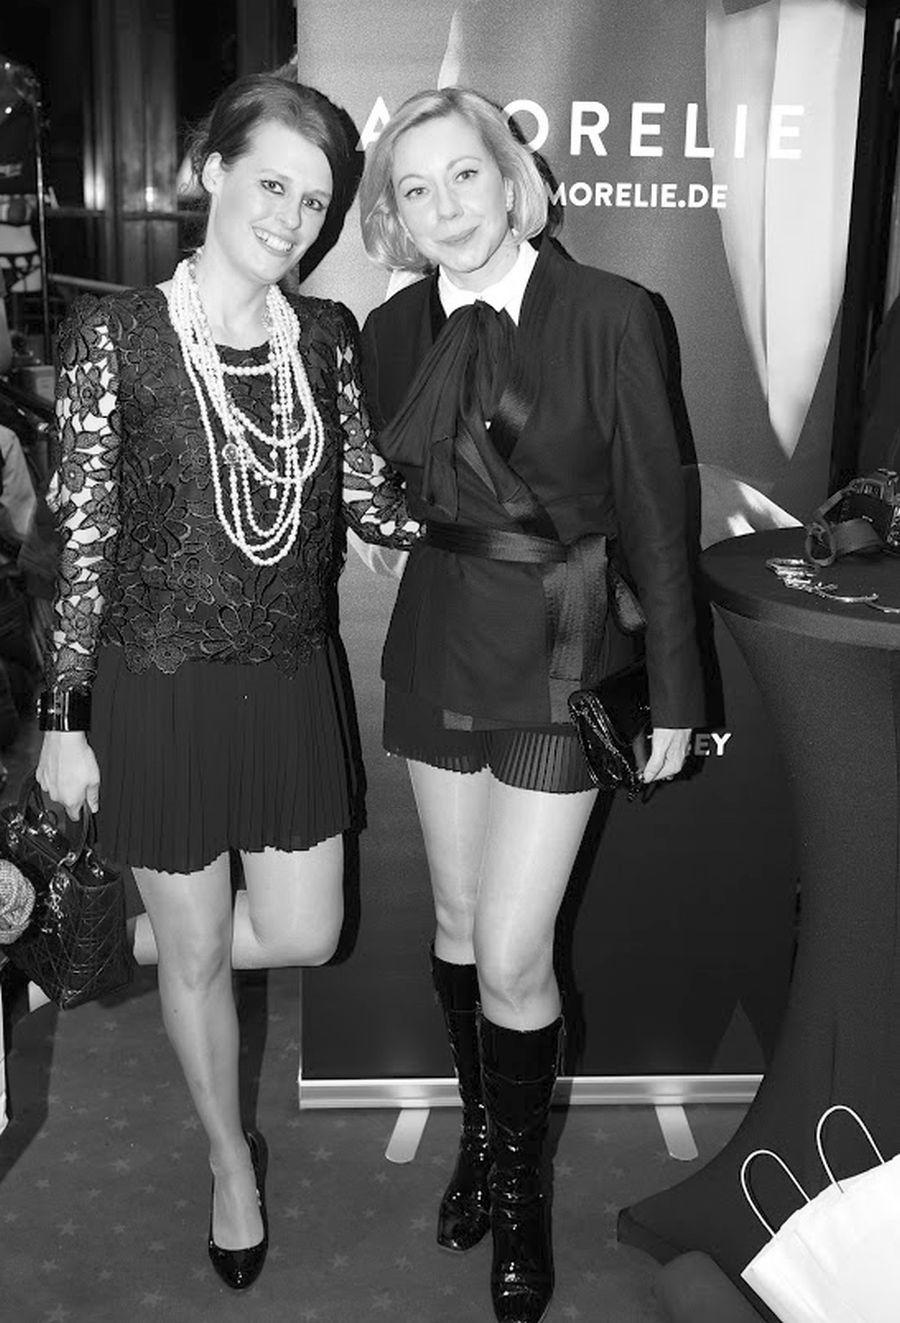 Amorelie,Shades of Grey Filmvorführung Hamburg, Modeblogger,Fashionblogger